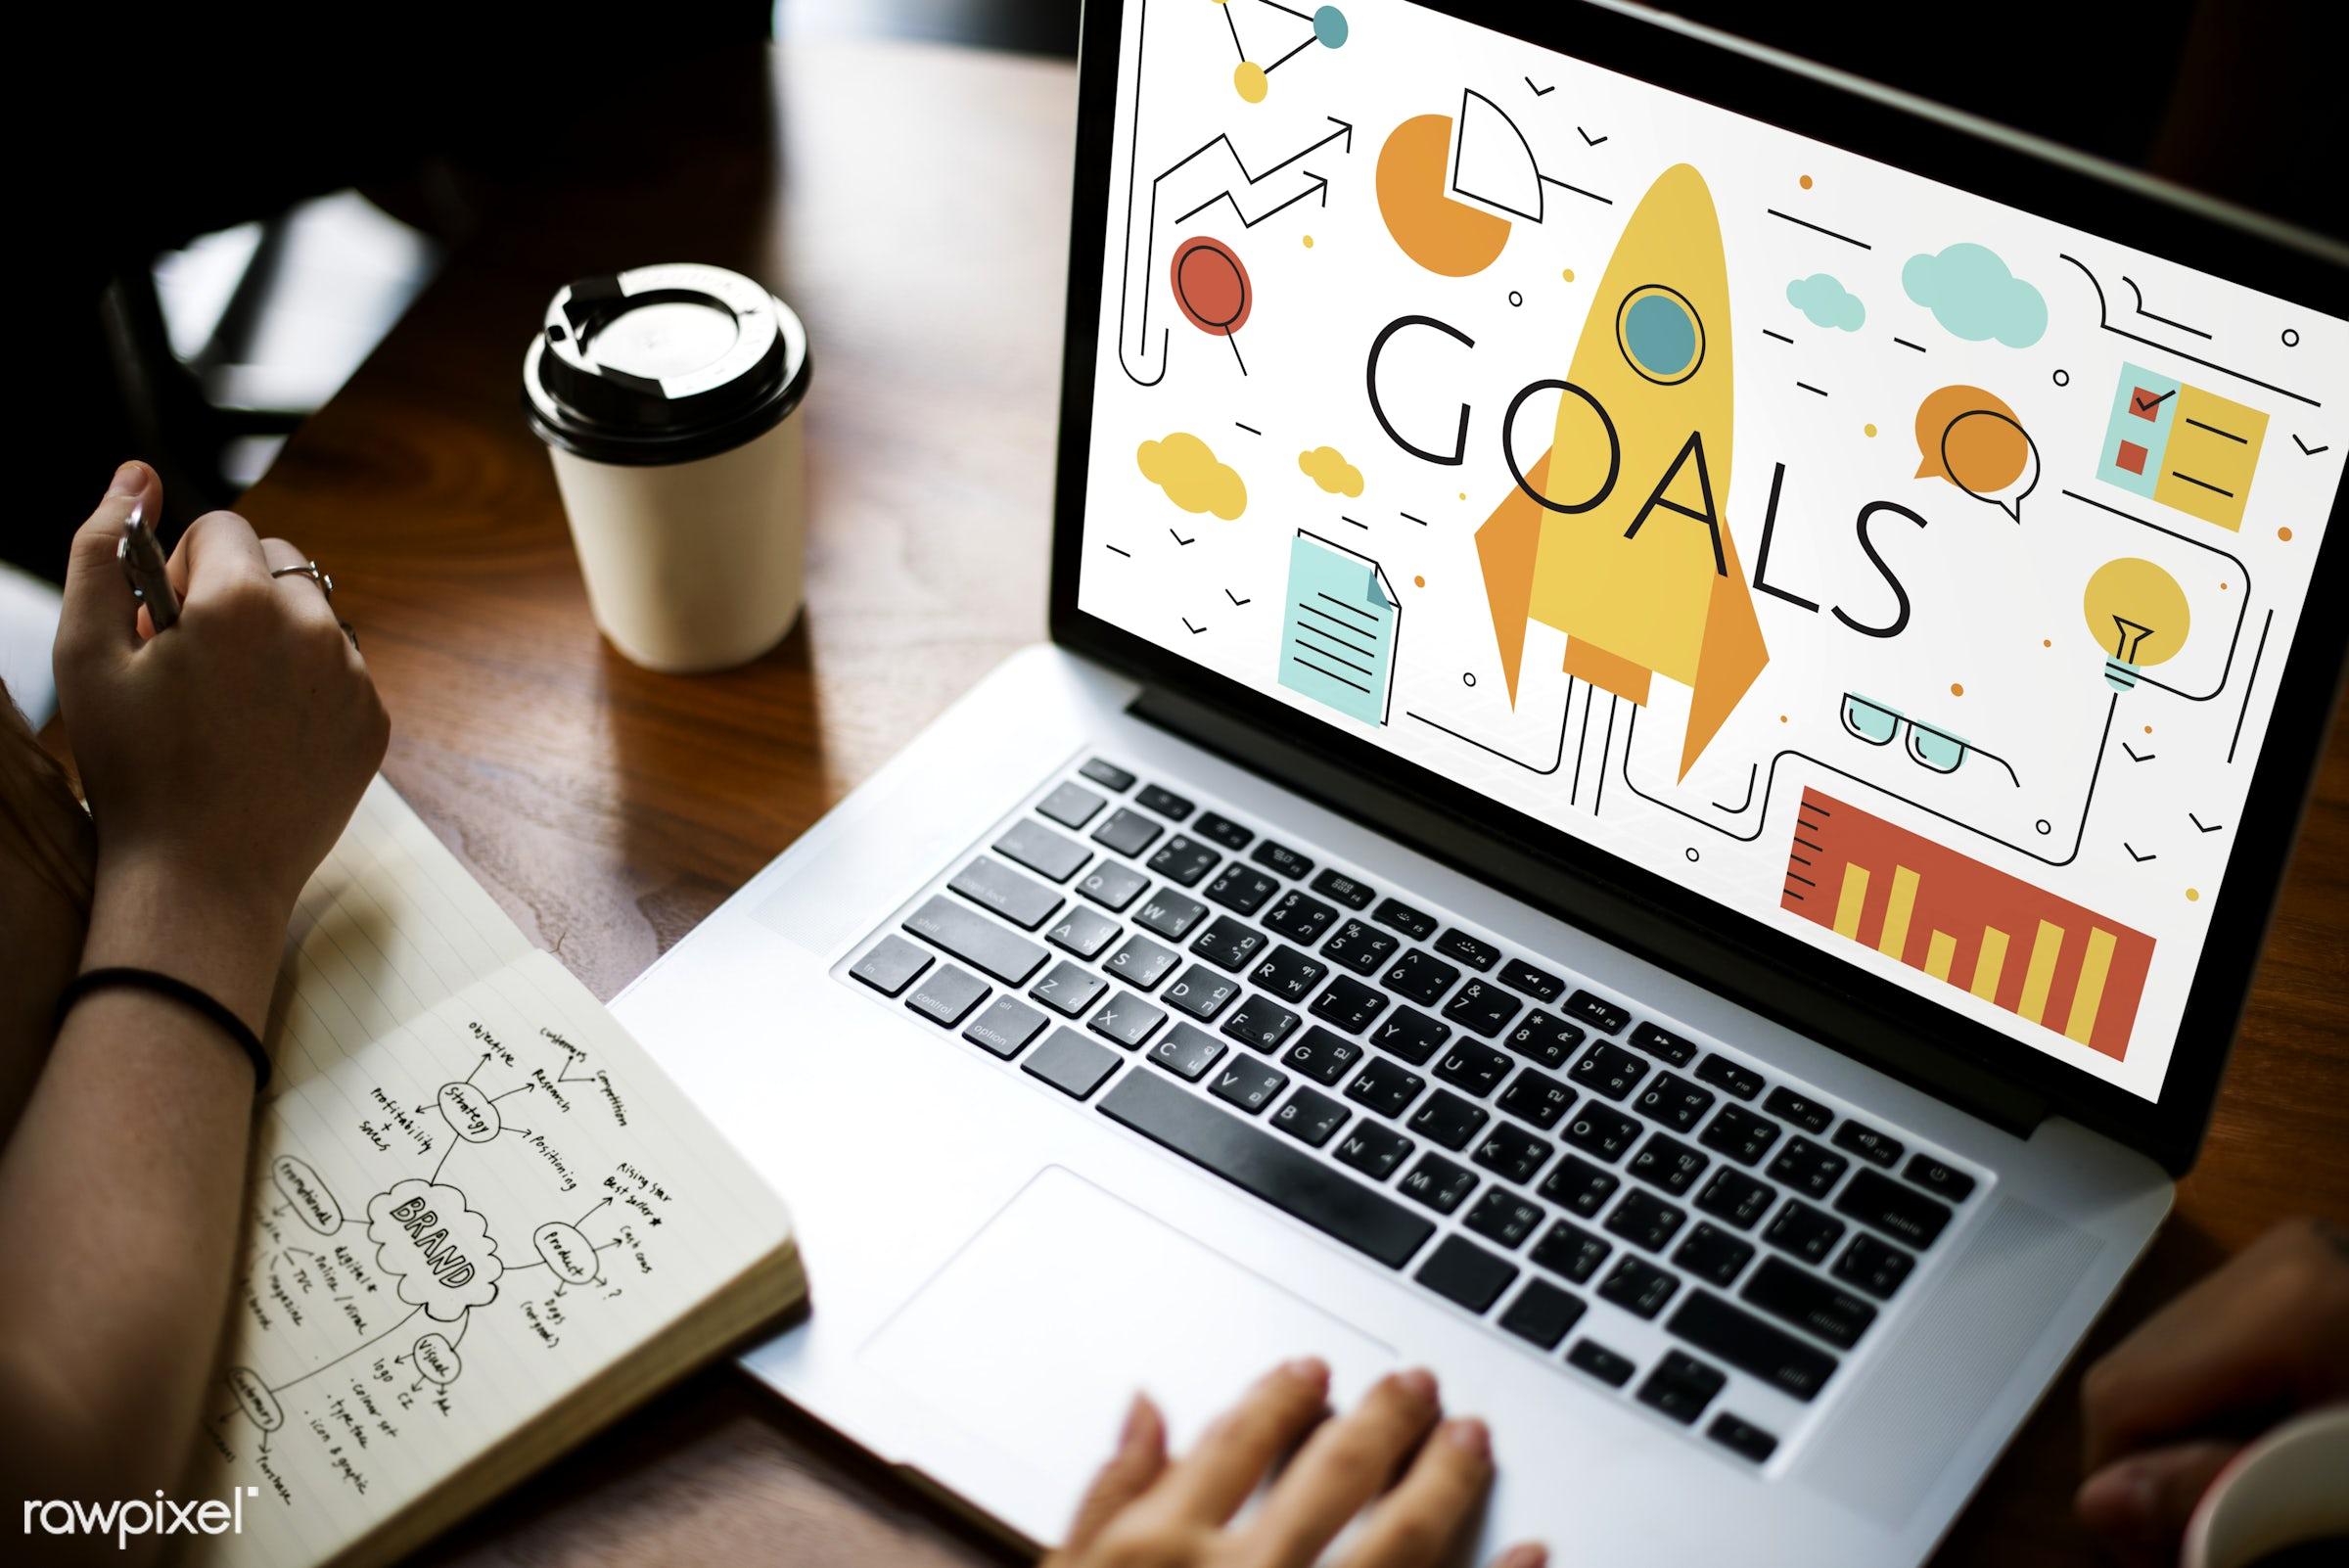 rocket, achievement, aim, analysis, browsing, business, coffee cup, development, device, digital, digital device, goals,...